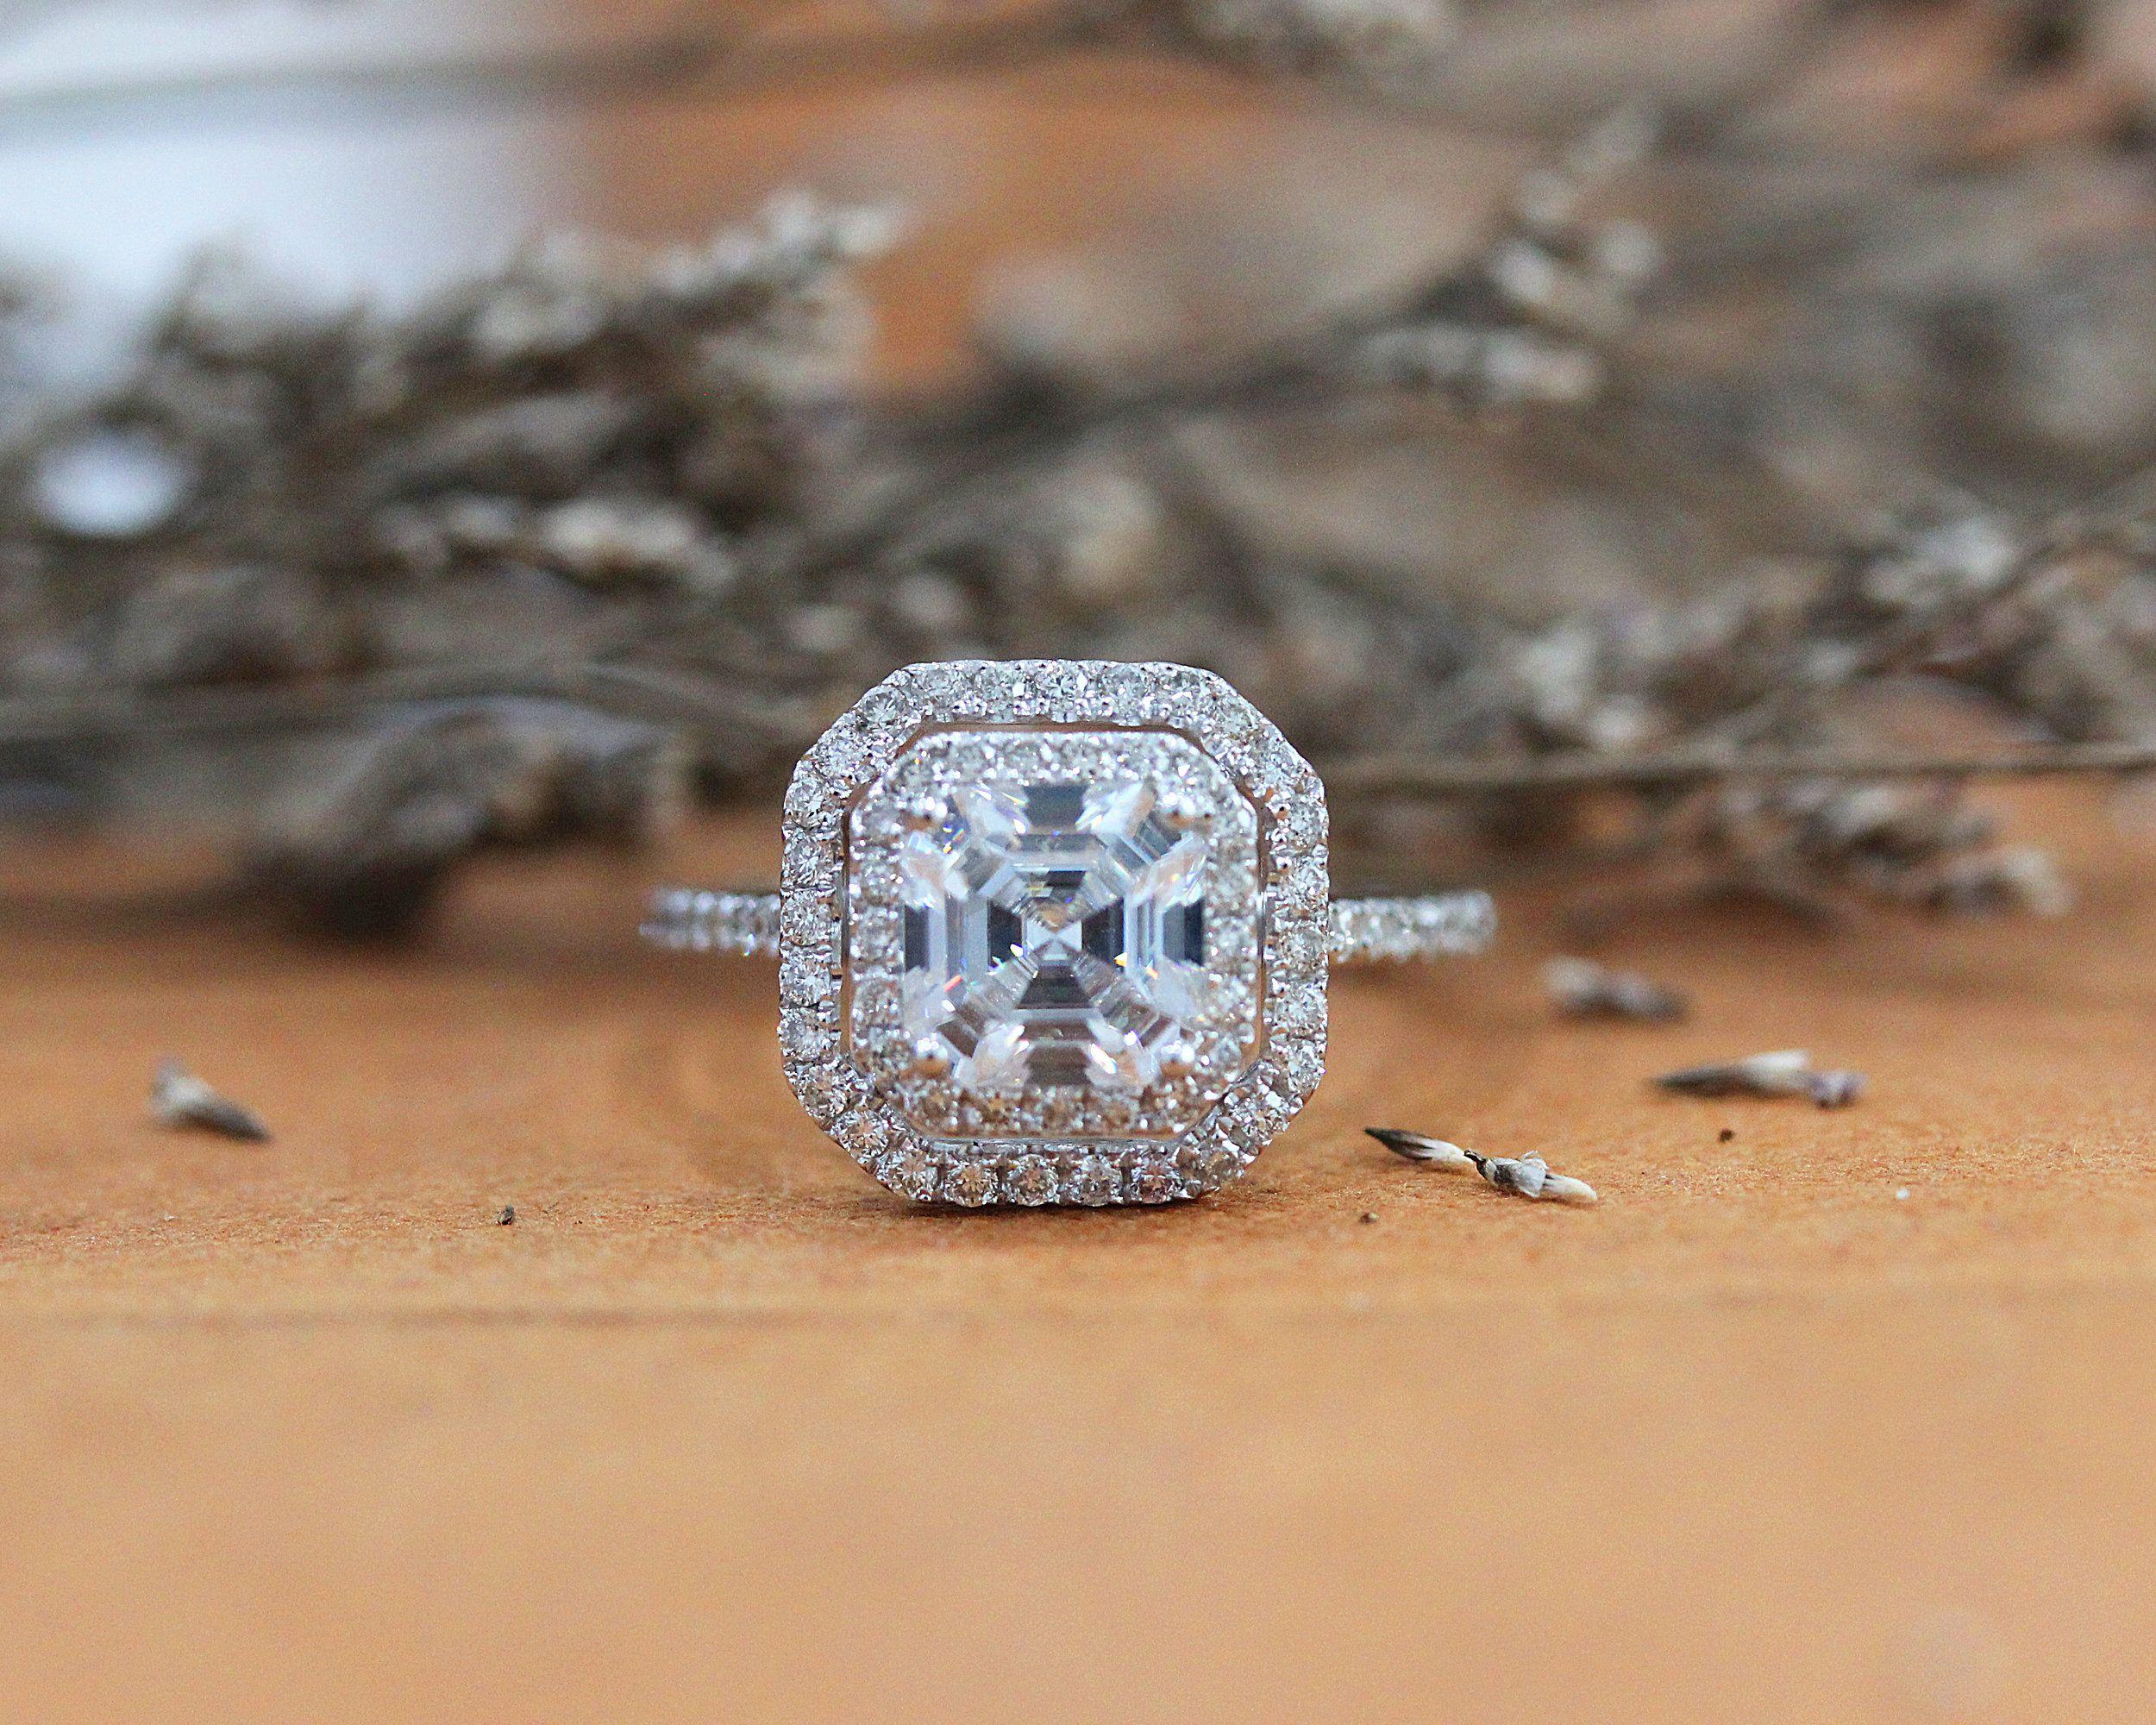 Wedding Gift Solid 14k Gold Engagement Ring Moissanite Diamond 18k Gold 1.50 CT White Gold Ring Solitaire Asscher Cut Moissanite Ring